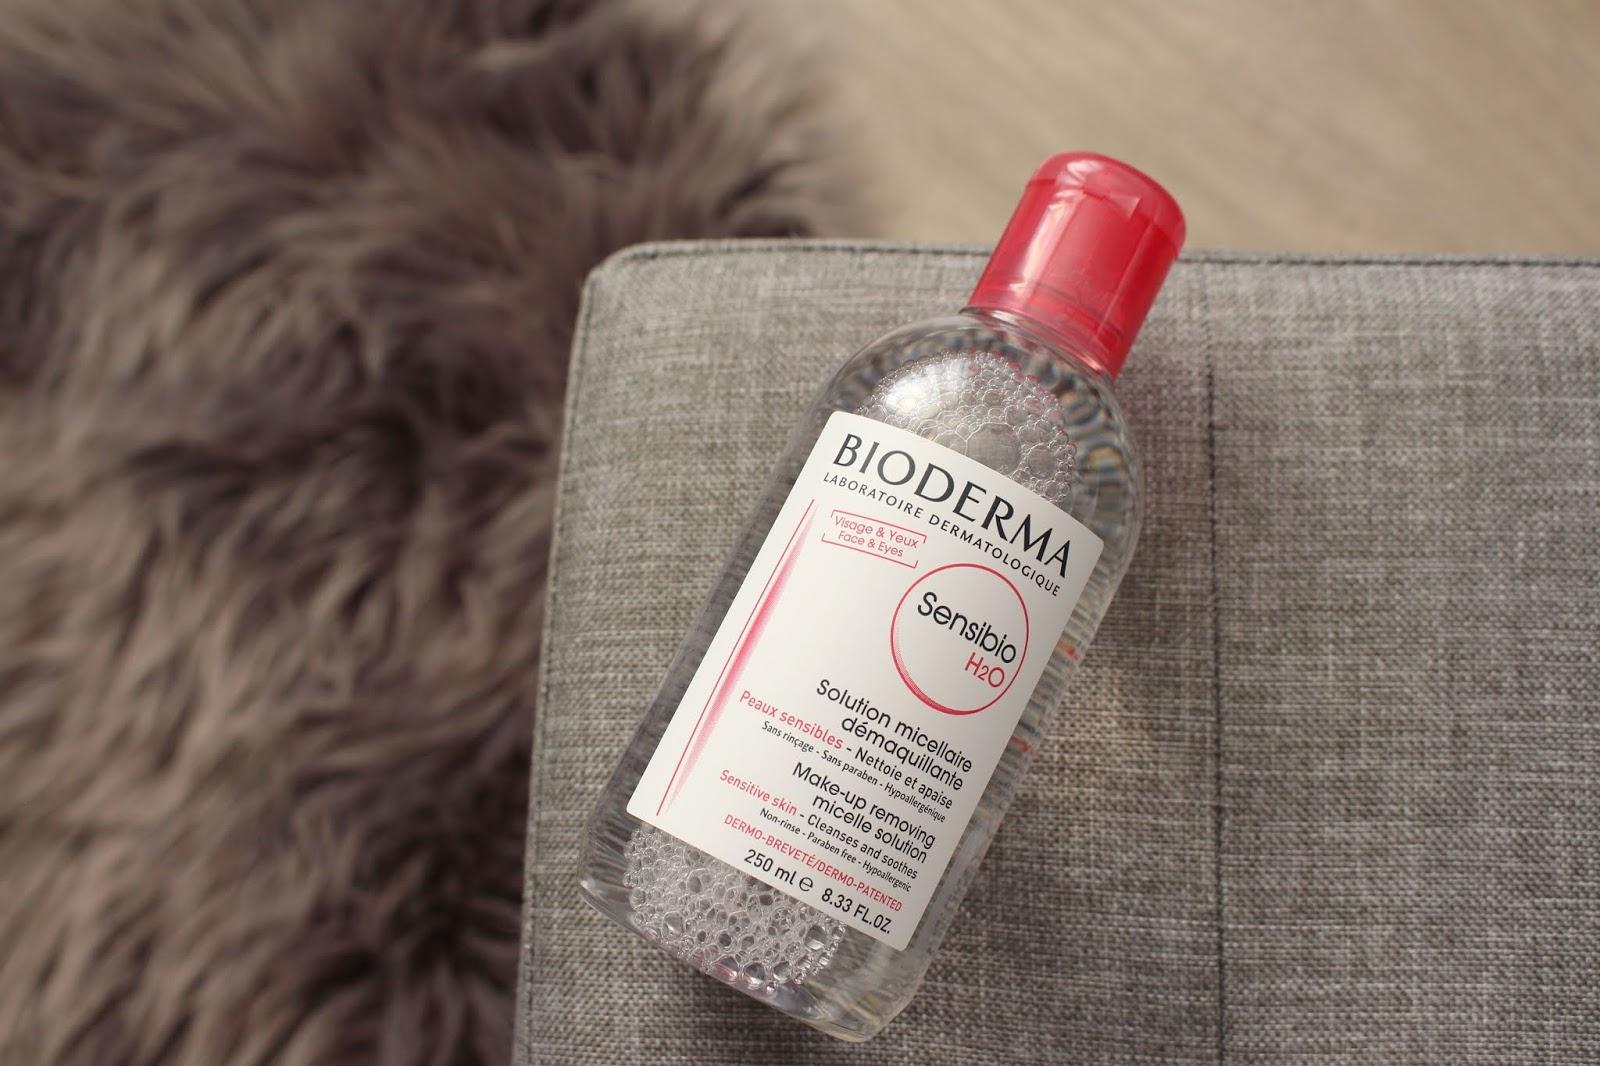 Bioderma Sensibio H2O produkt